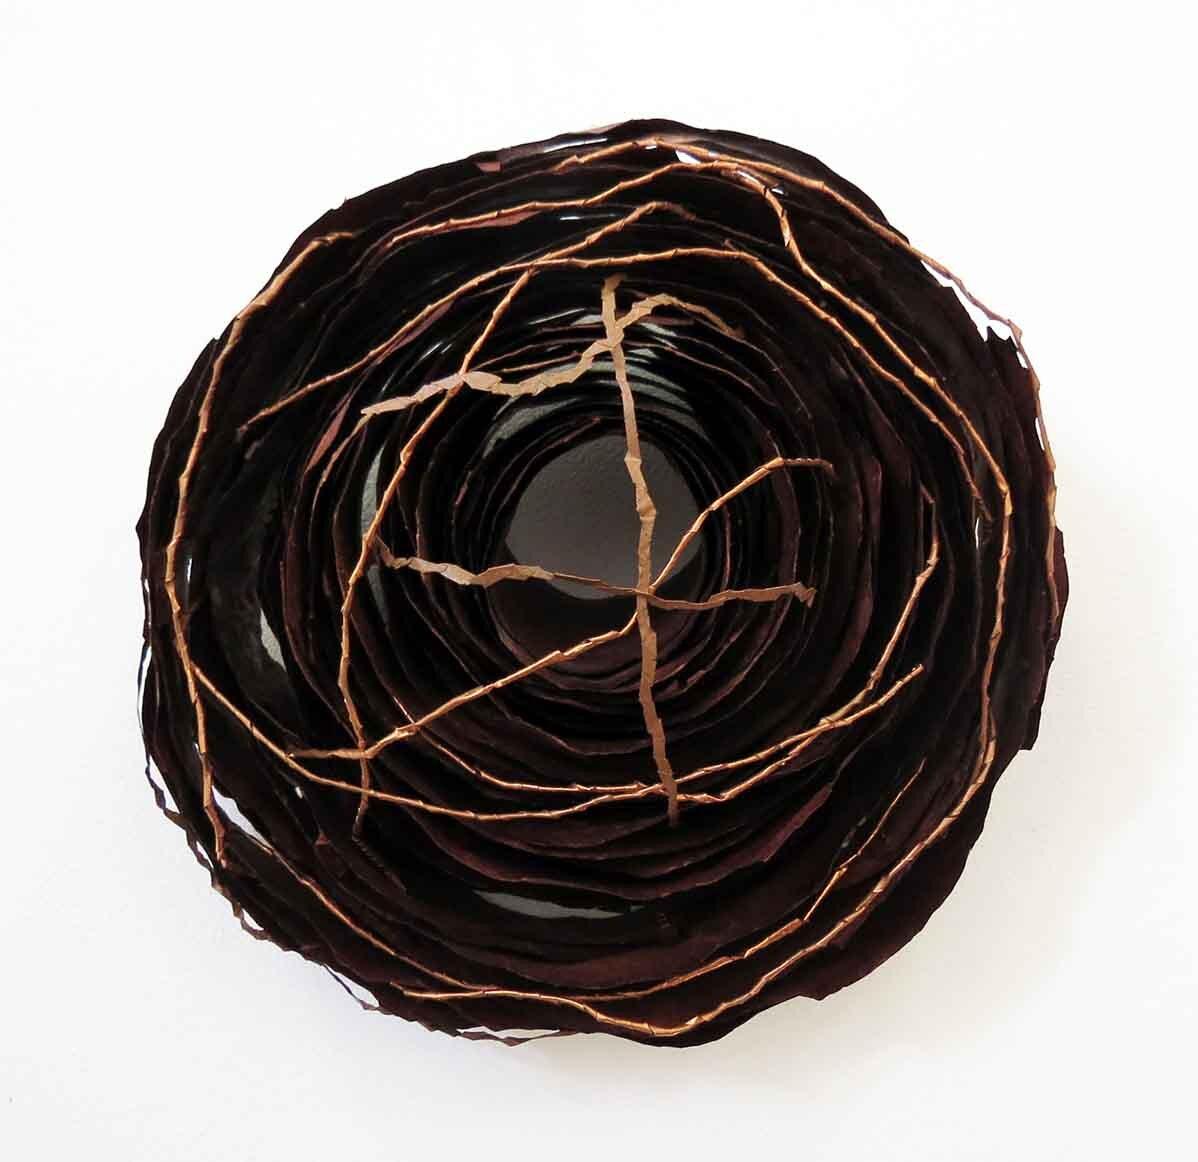 34. Monique Tippett, Sheoak, 2019, recycled paper, balga resin, copper, 30 x 30 x 14 cm $450